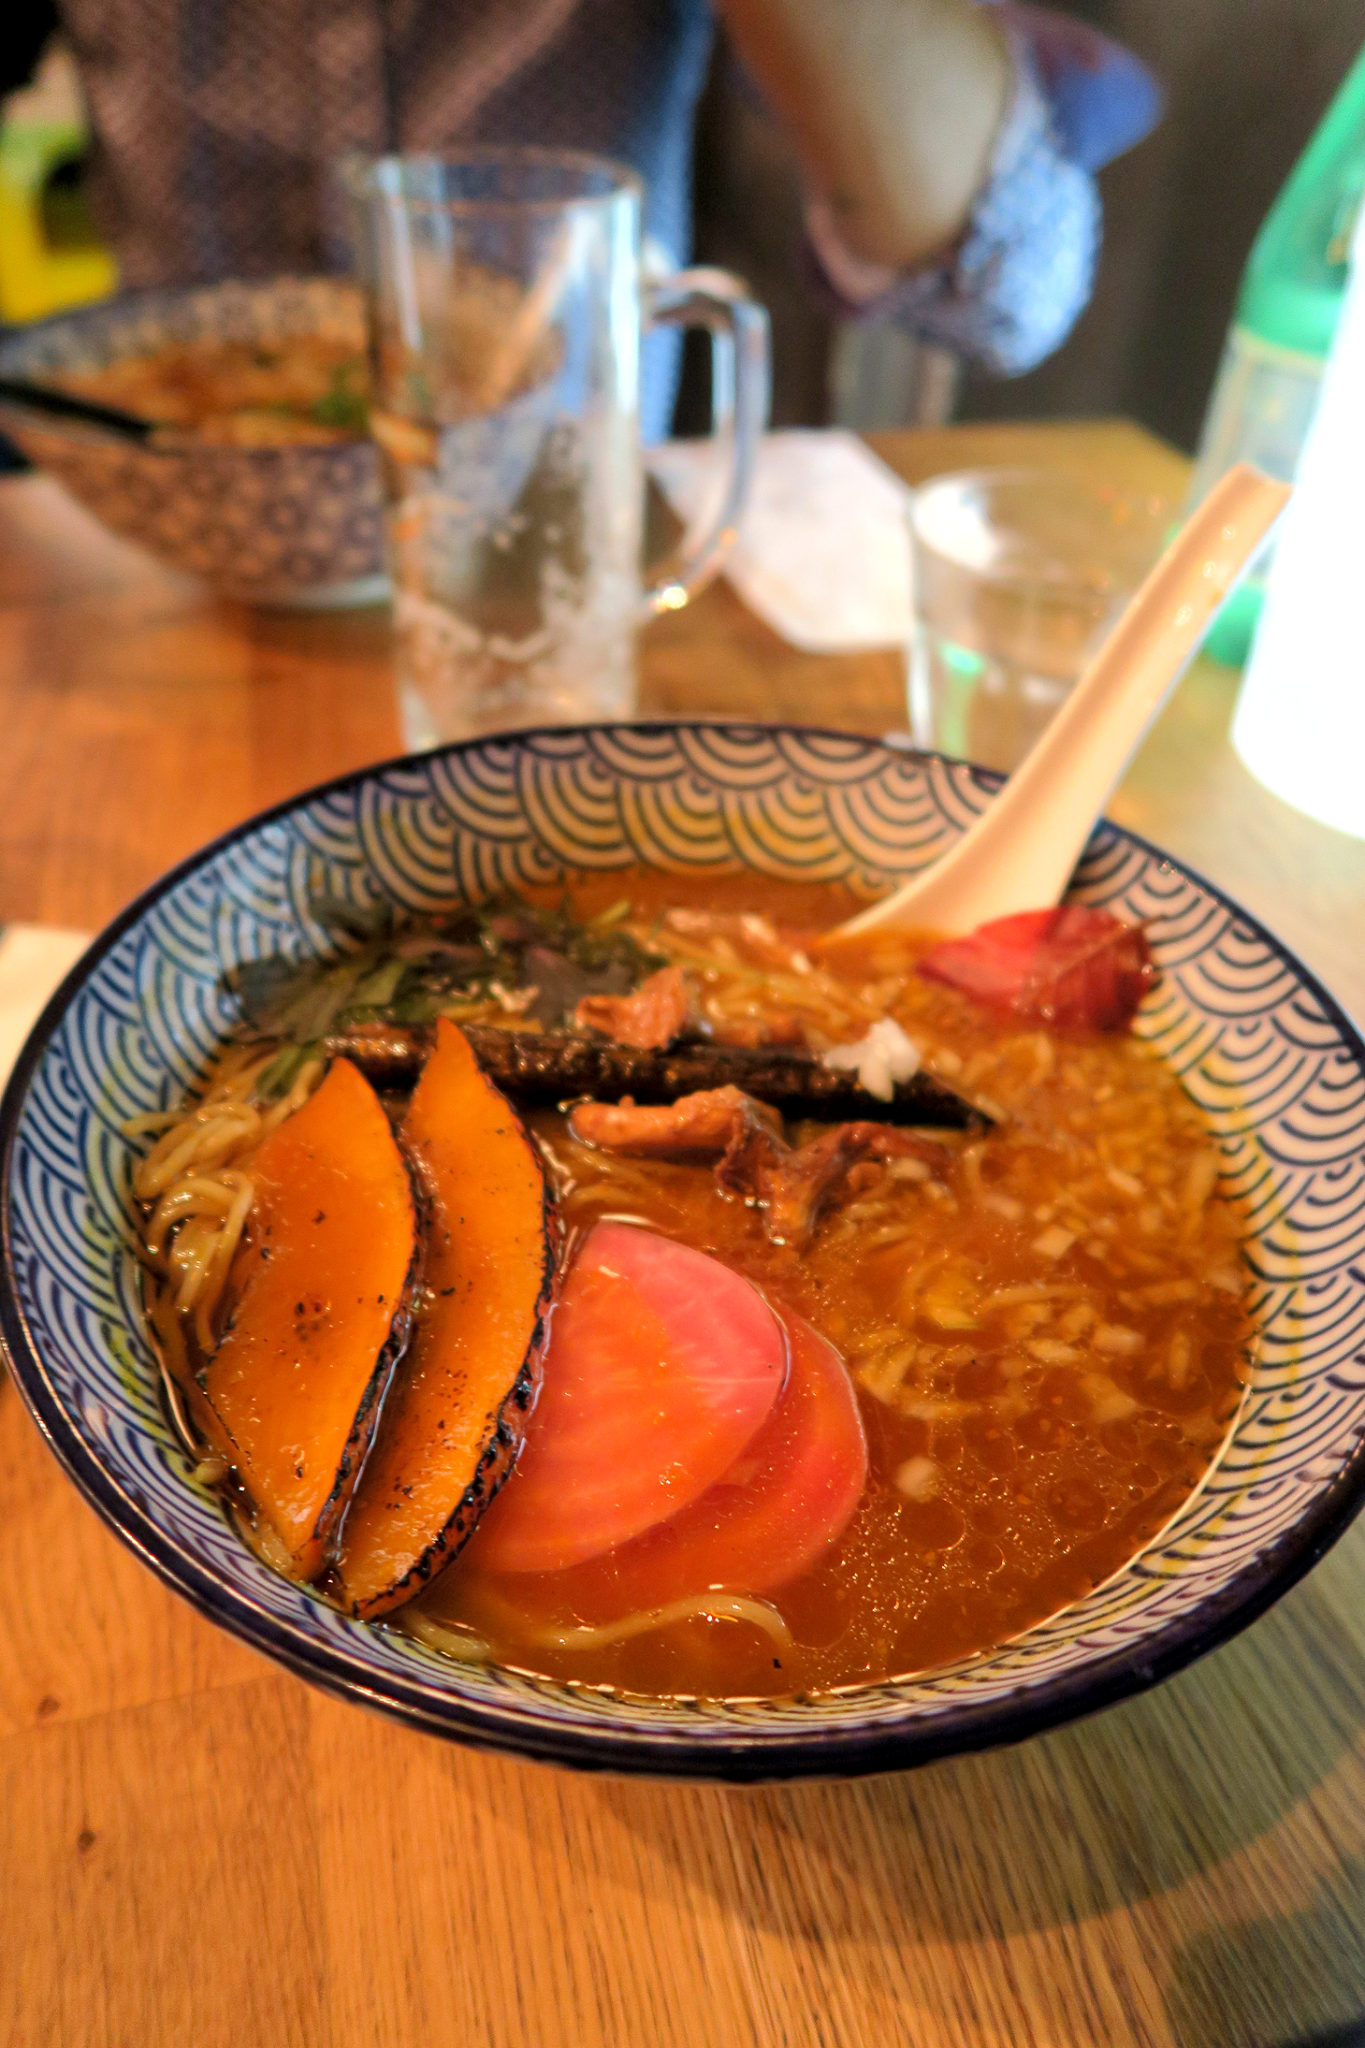 Ramen végétarien potimarron paitan du restaurant japonais Kodawari Ramen à Paris